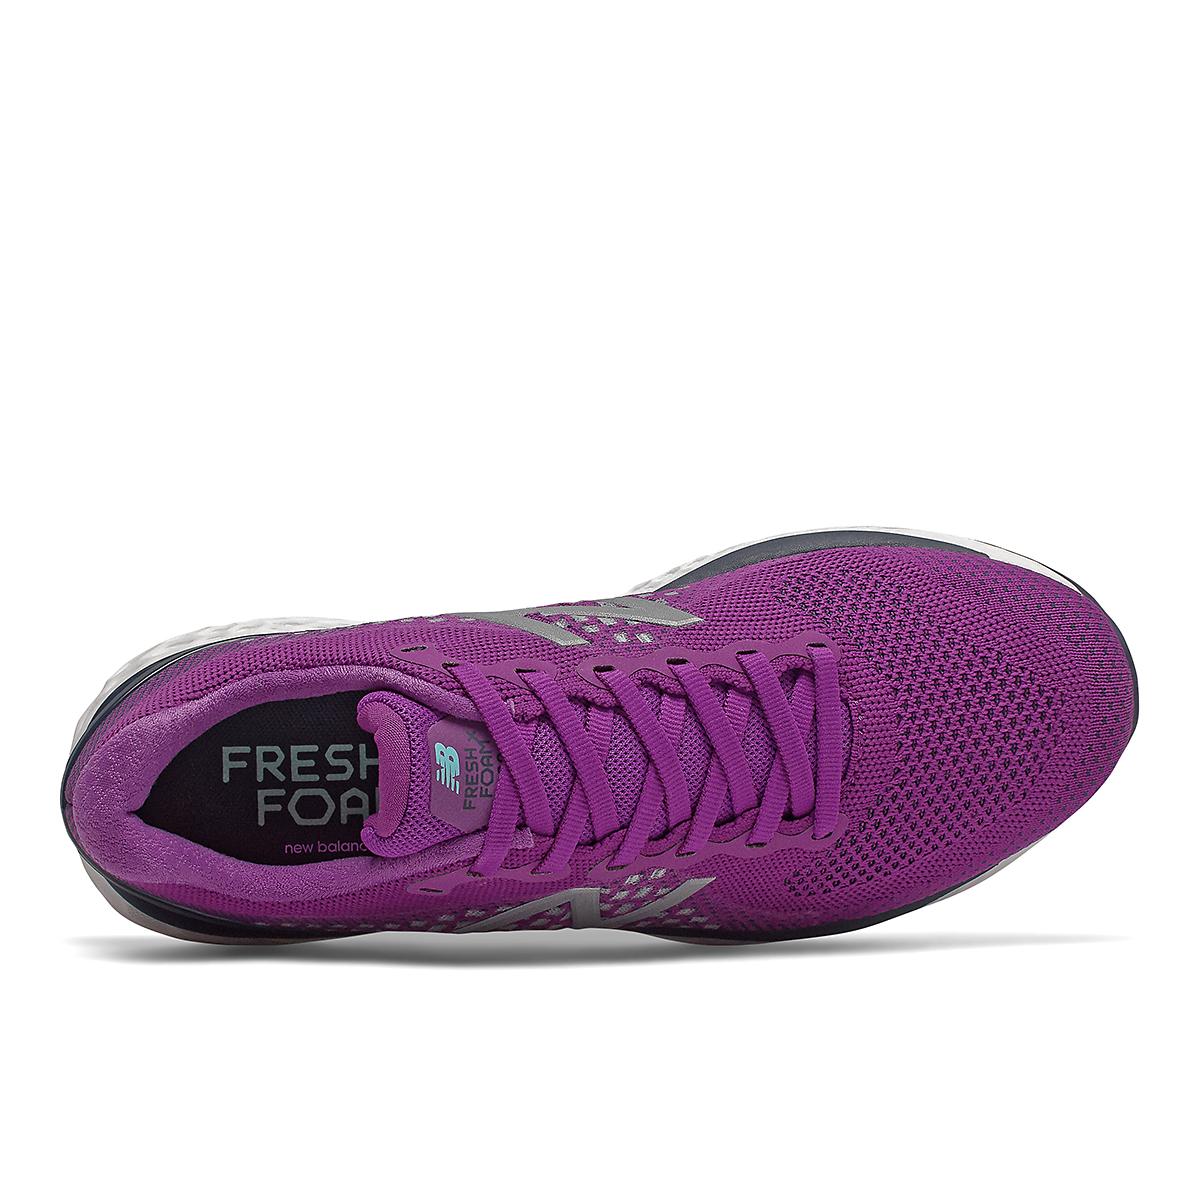 Women's New Balance 880V10 Running Shoe - Color: Plum - Size: 5 - Width: Narrow, Plum, large, image 3